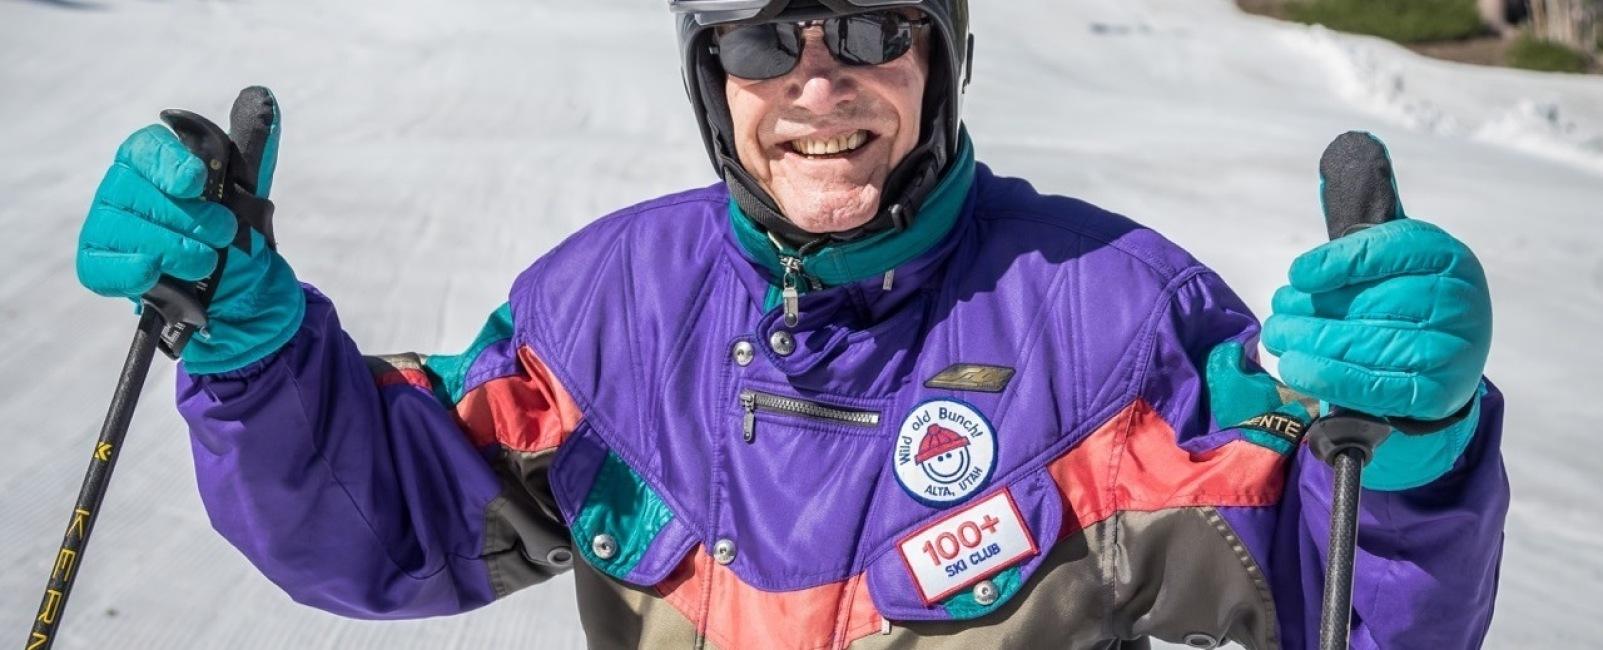 100th Birthday On Skis